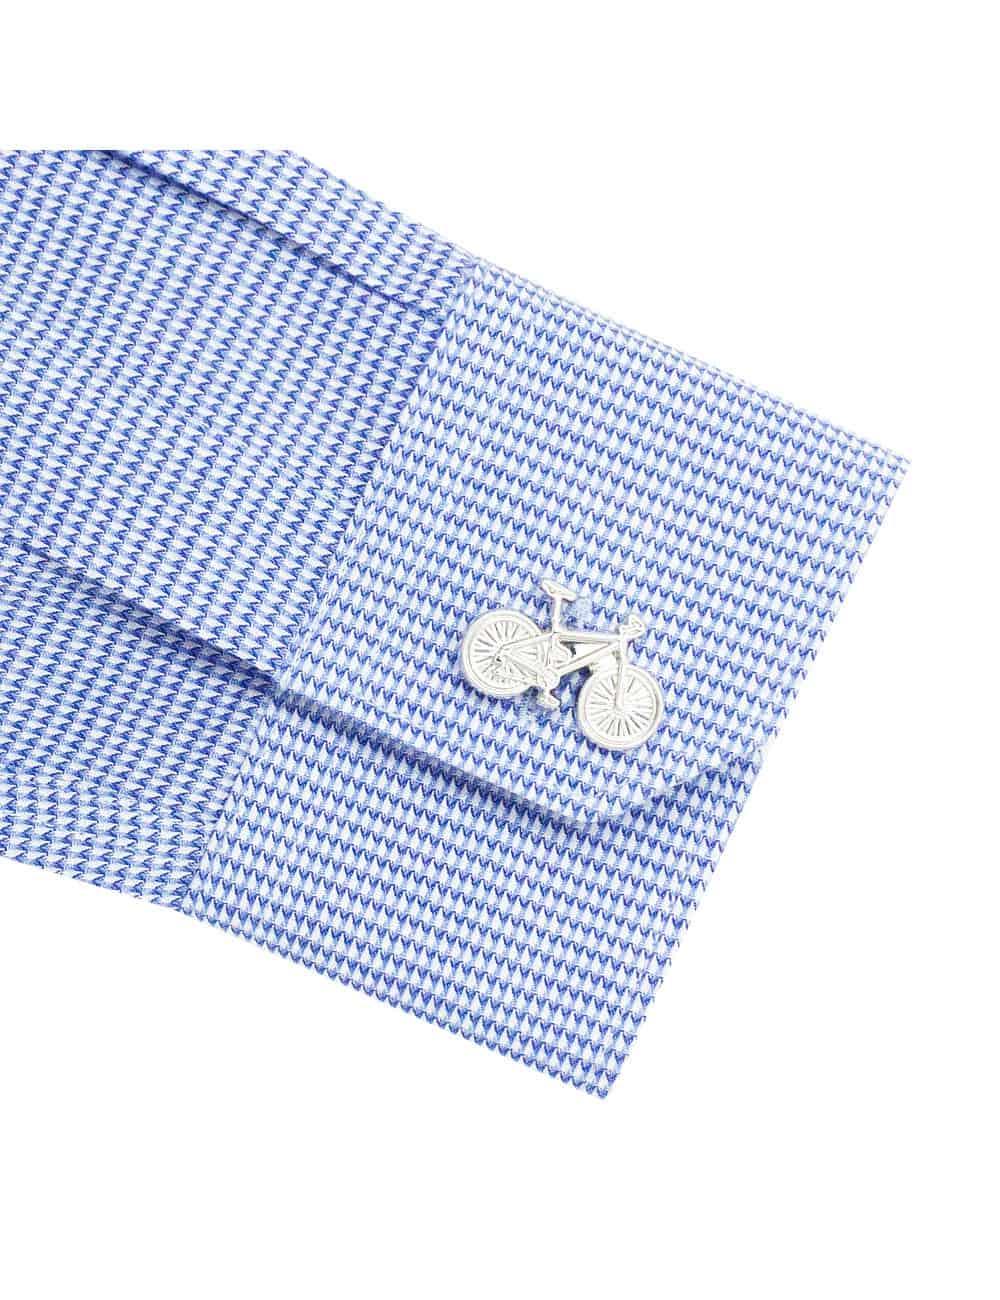 TF Navy Pattern Cotton Blend Spill Resistant Long Sleeve Single Cuff Shirt TF2A6.15